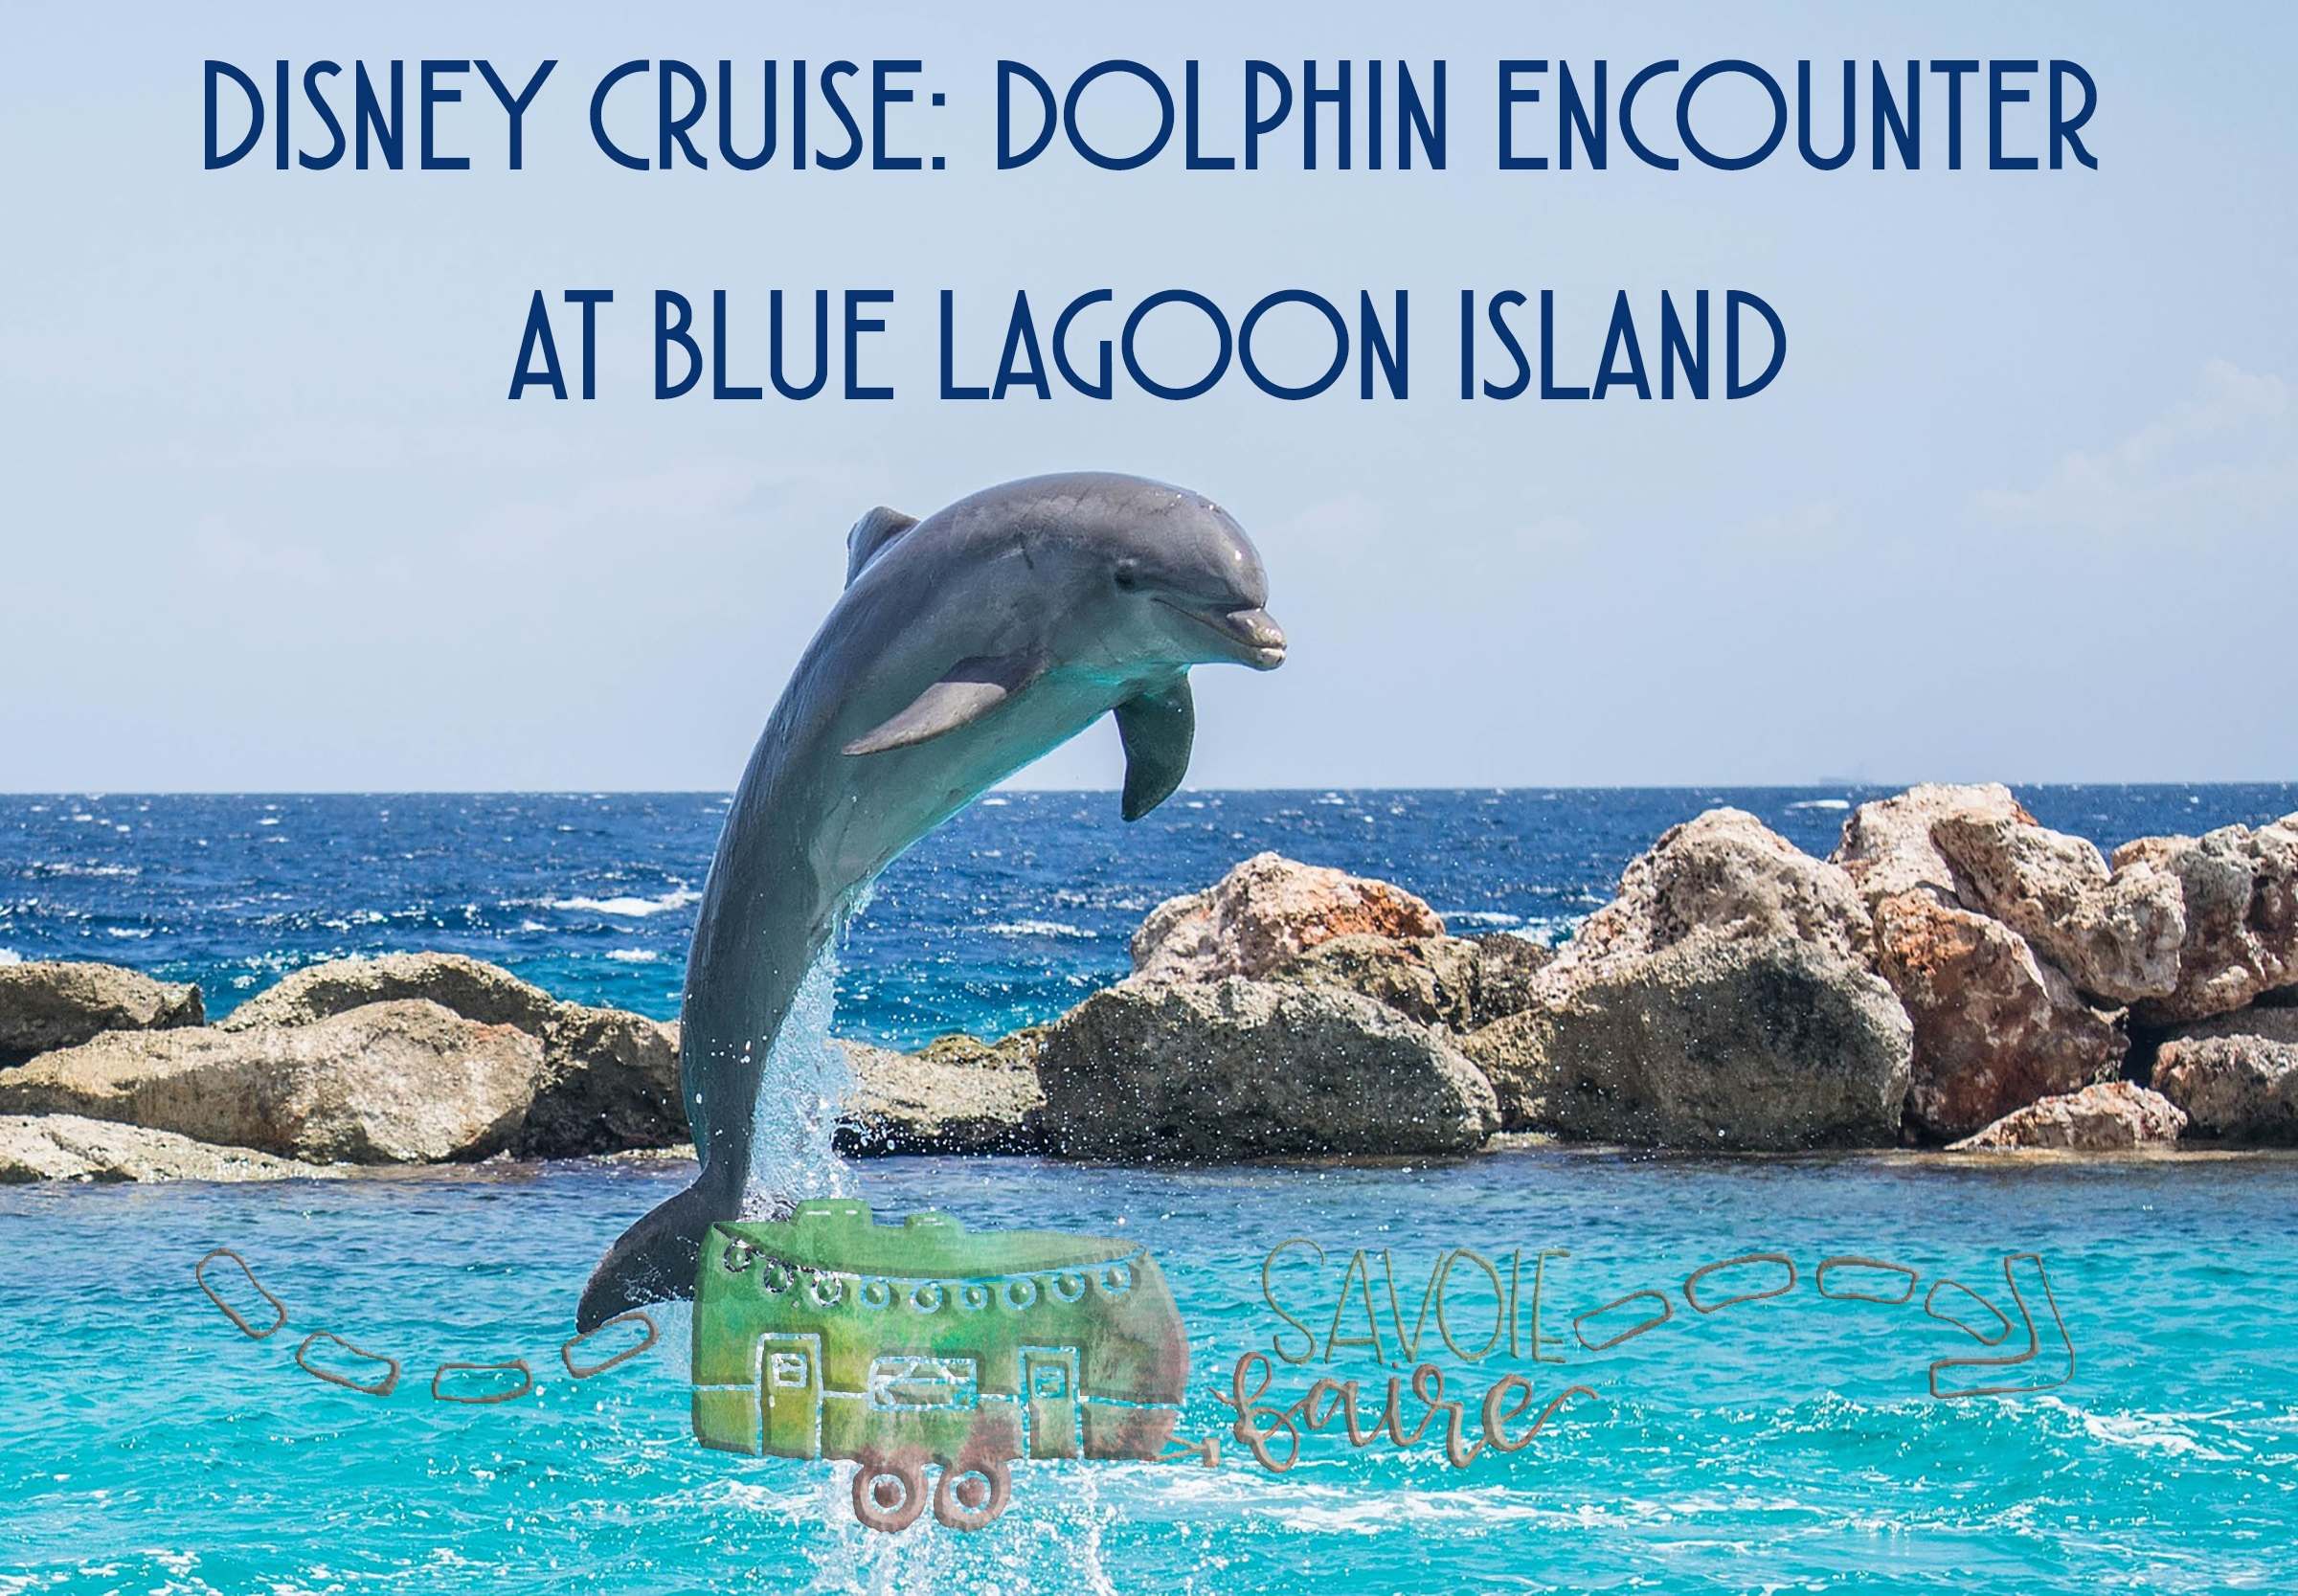 Disney Cruise Dolphin Encounter Savoie Faire